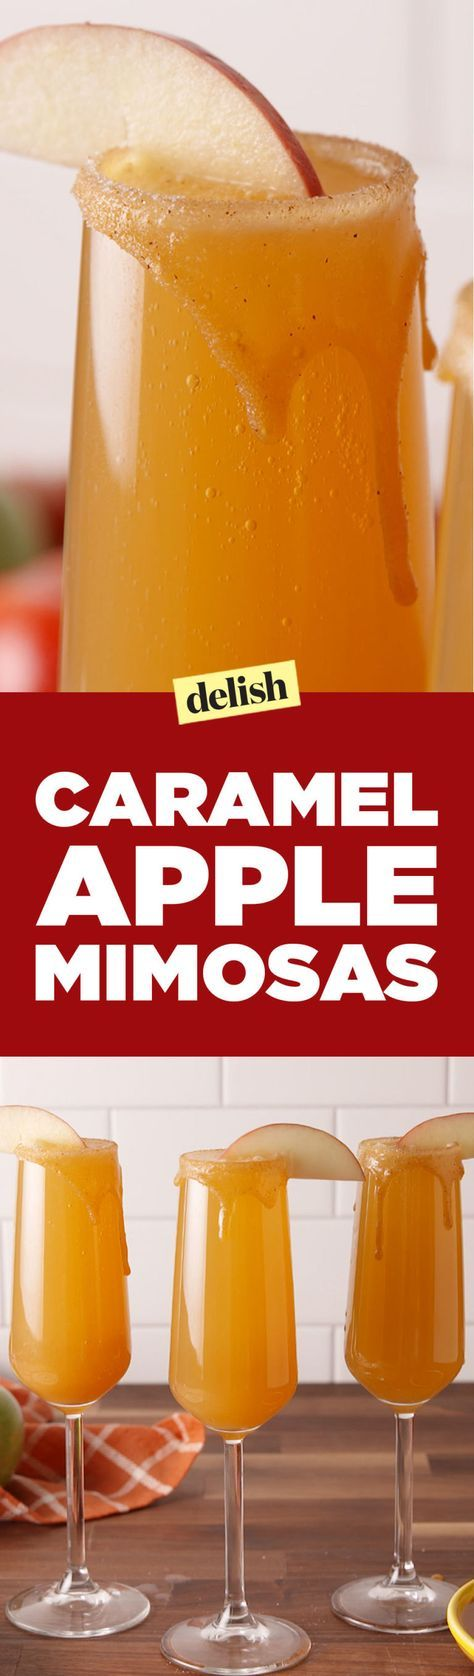 Caramel Apple Mimosas Are The New Apple Cider Mimosas  - Delish.com